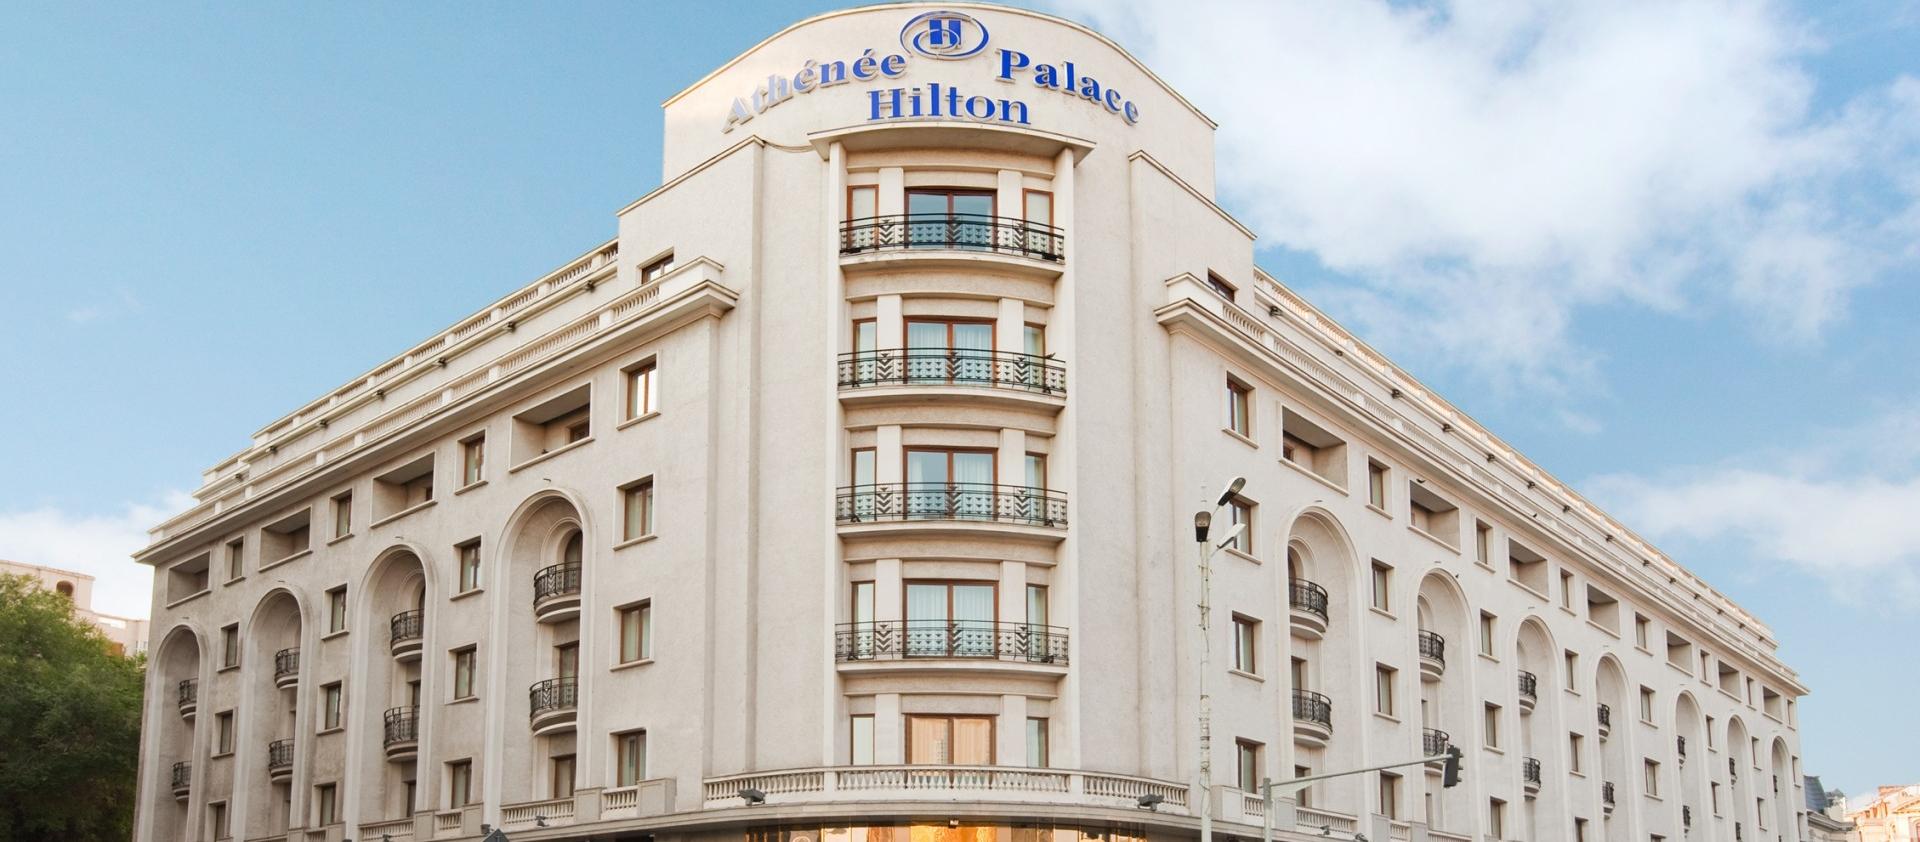 Ath n e palace hilton luxury hotel bucharest ath n e for Hotel palace